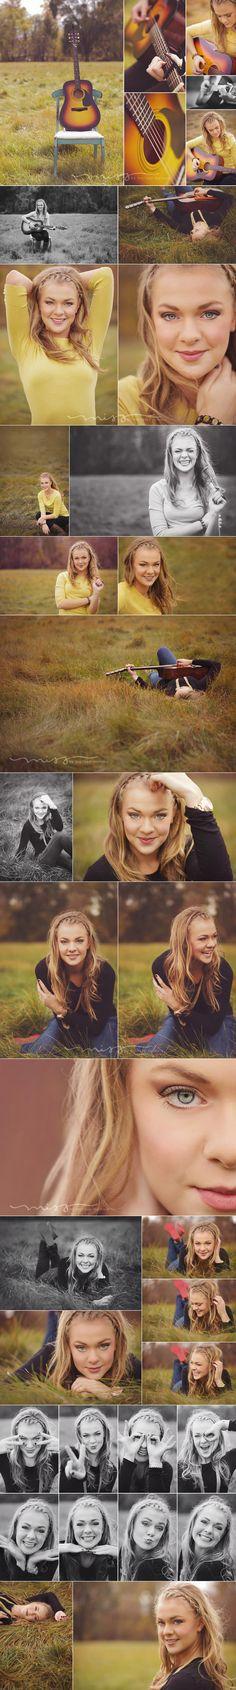 Saginaw Michigan Senior Photographer | Rachel Class of 2014 » Miss by Marissa